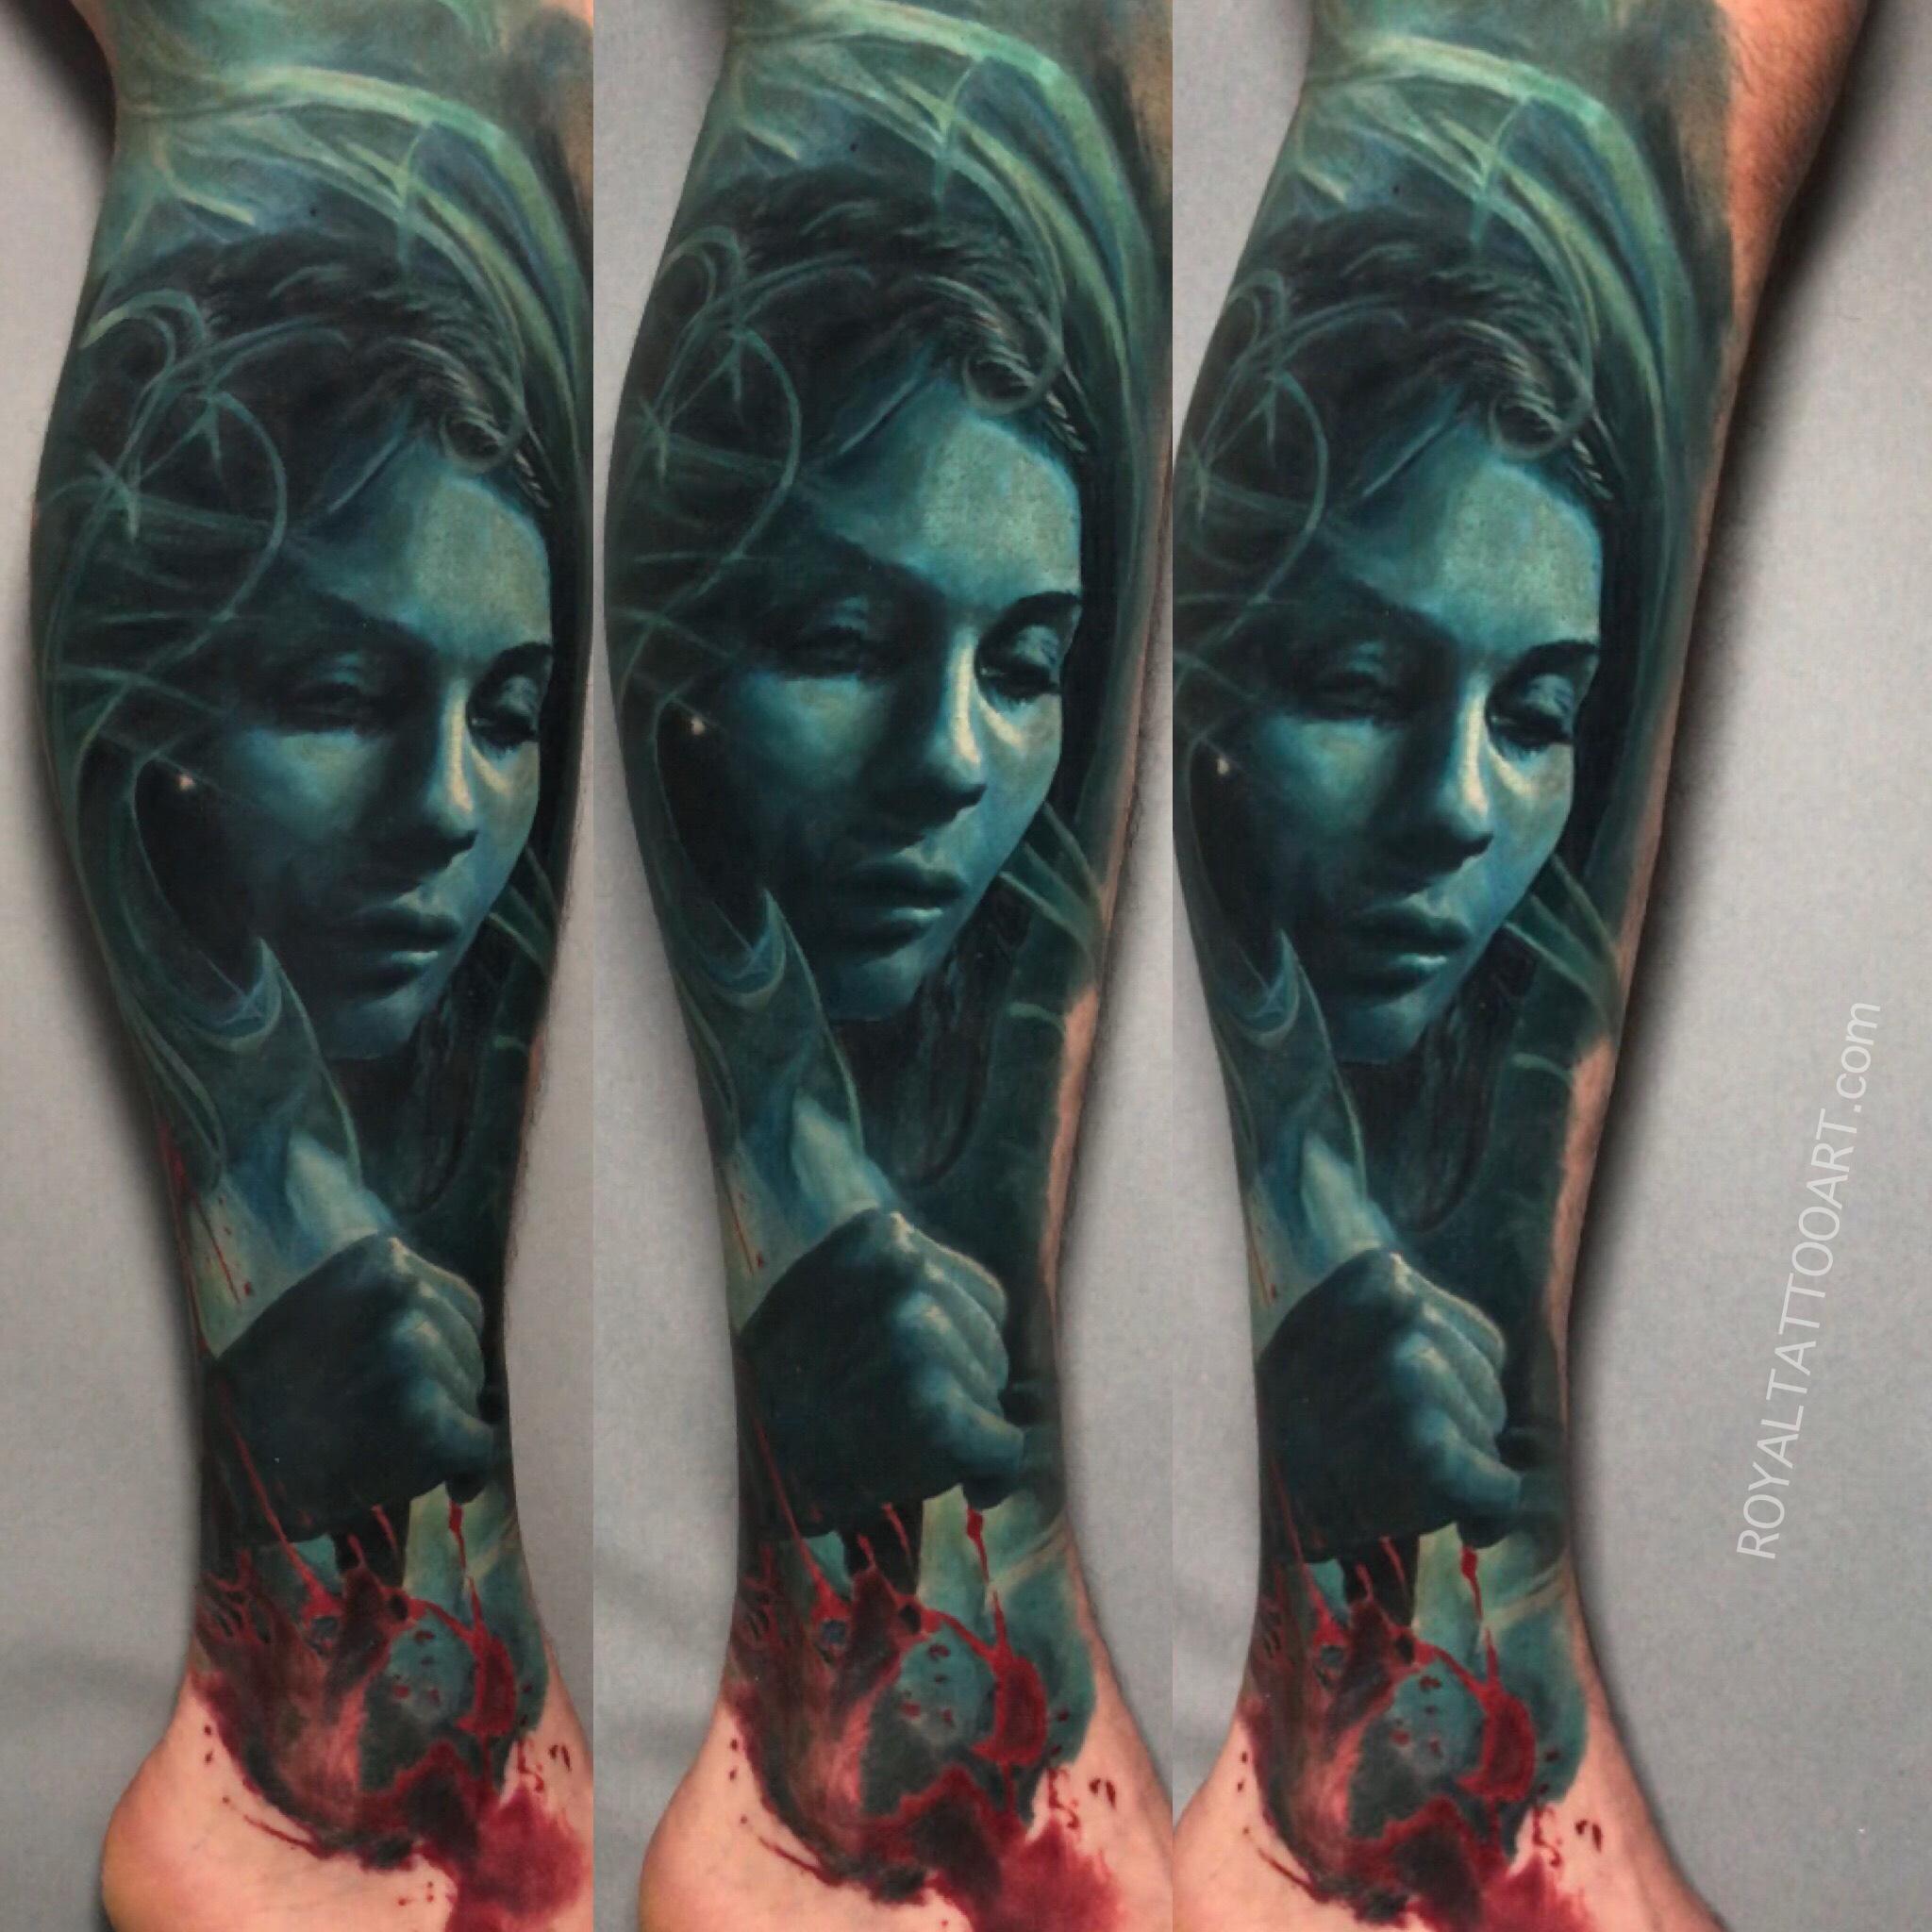 dark art portrait color realism horror scary tattoo realisitc nyc new yorl